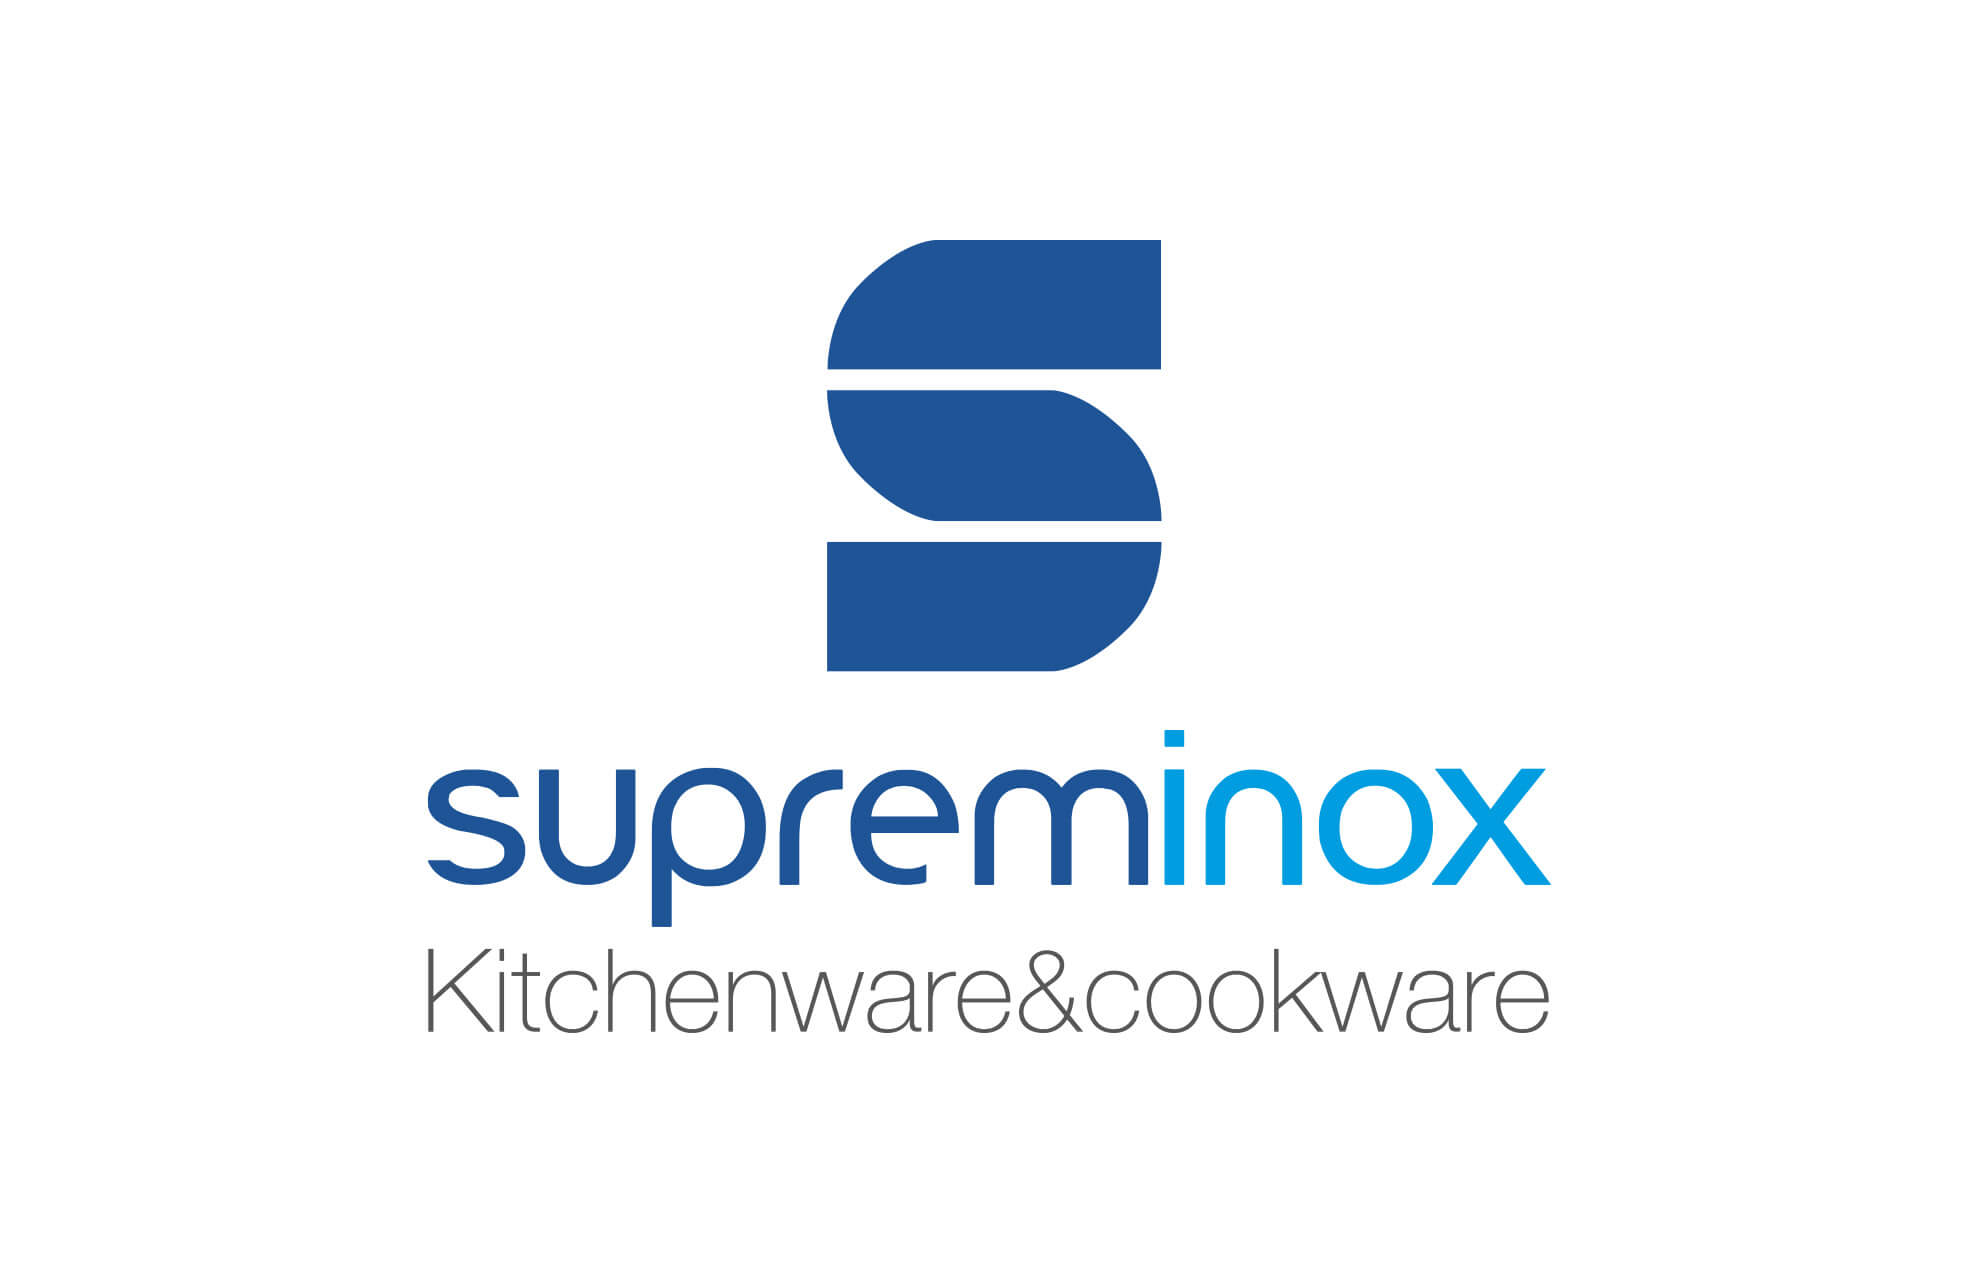 Supreminox logotipo branding1 - Restyling de branding para Supreminox